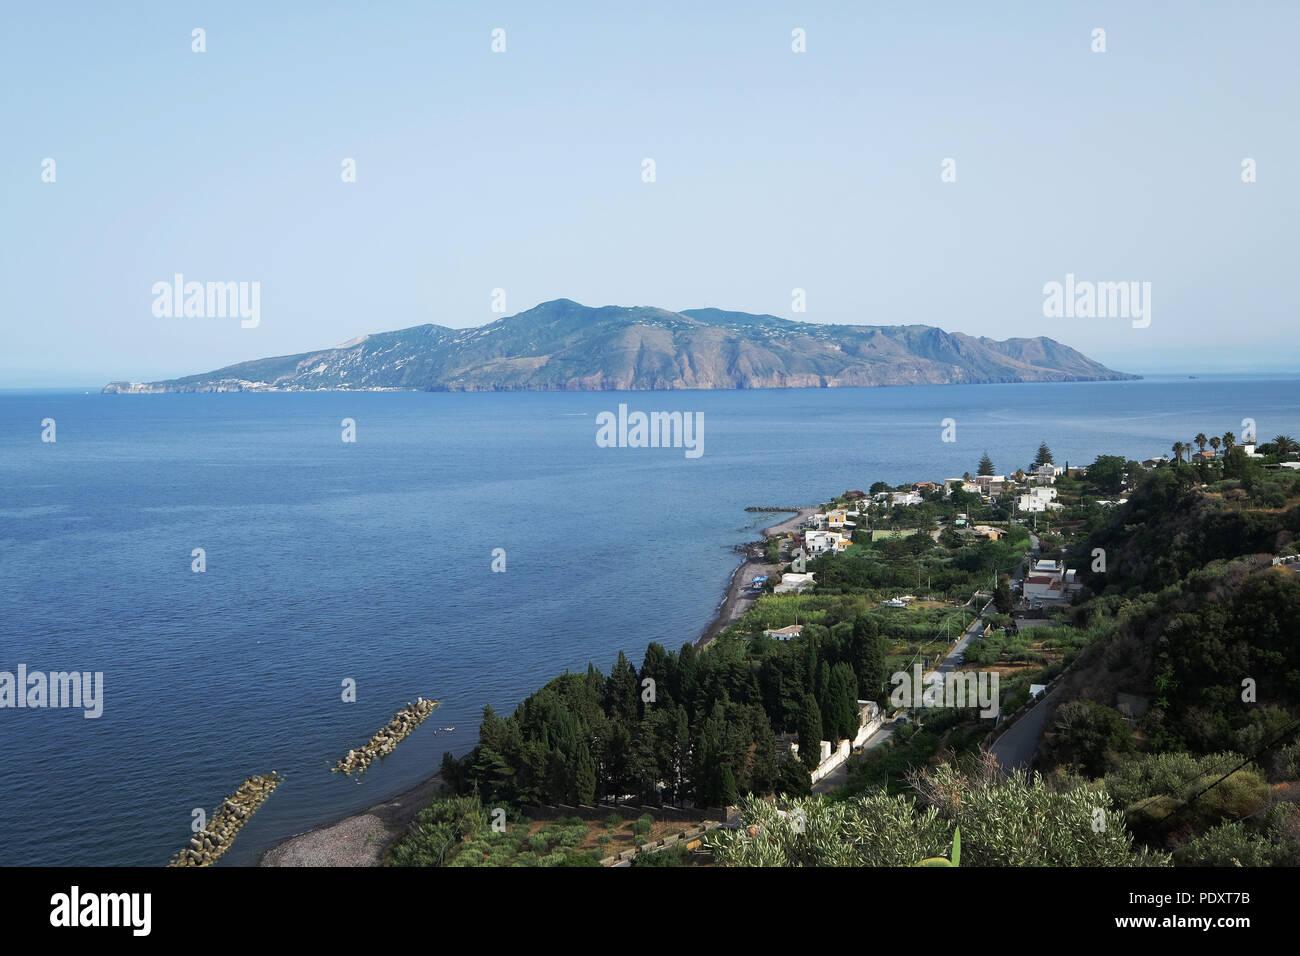 Lingua, view from above, Salina, Aeolian islands,Sicily, Italy - Stock Image